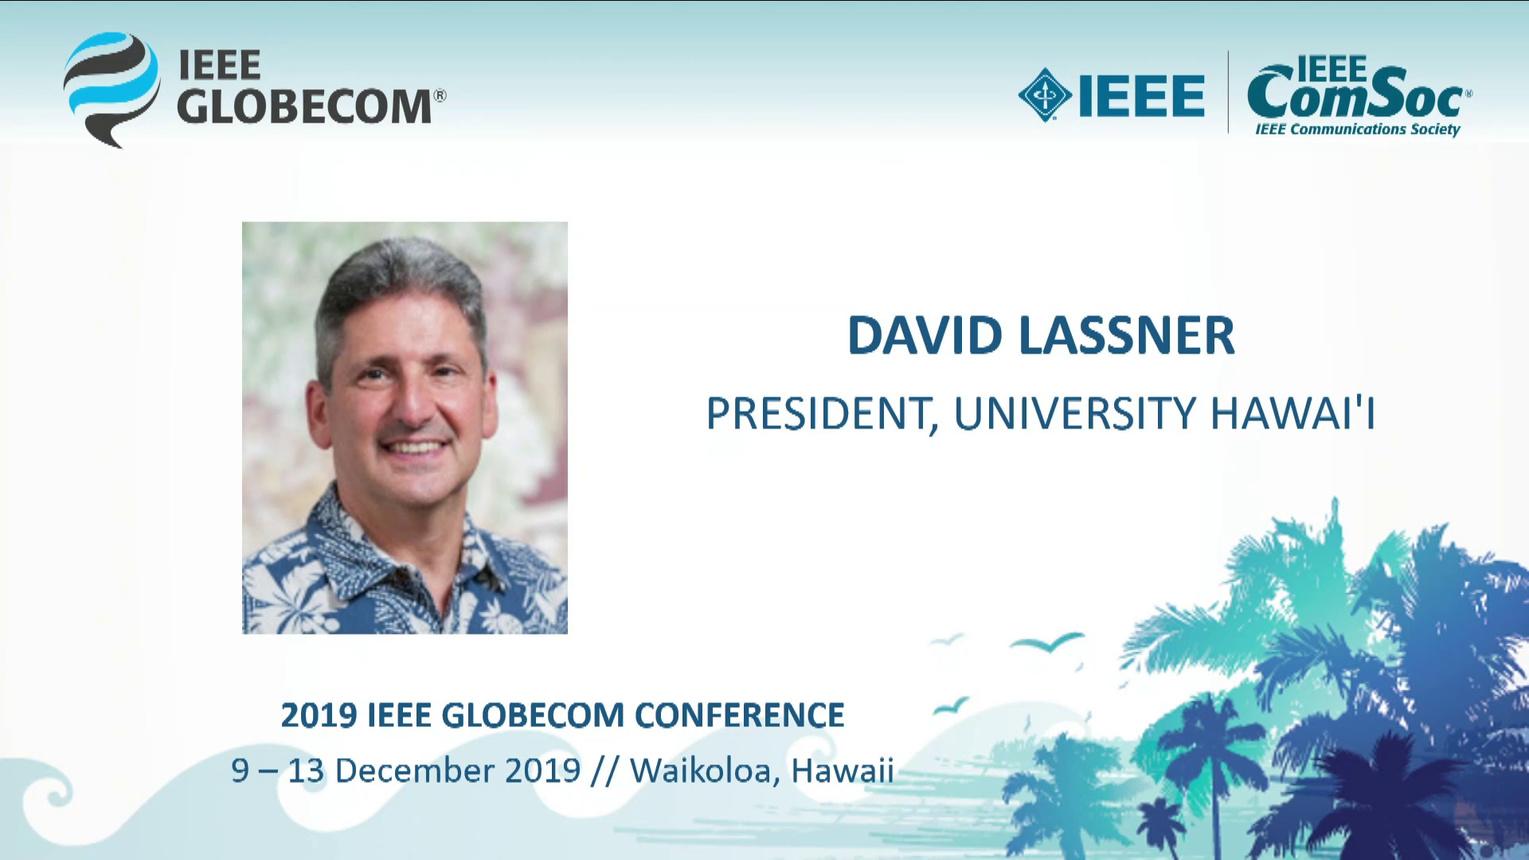 Globecom 2019: David Lassner Keynote